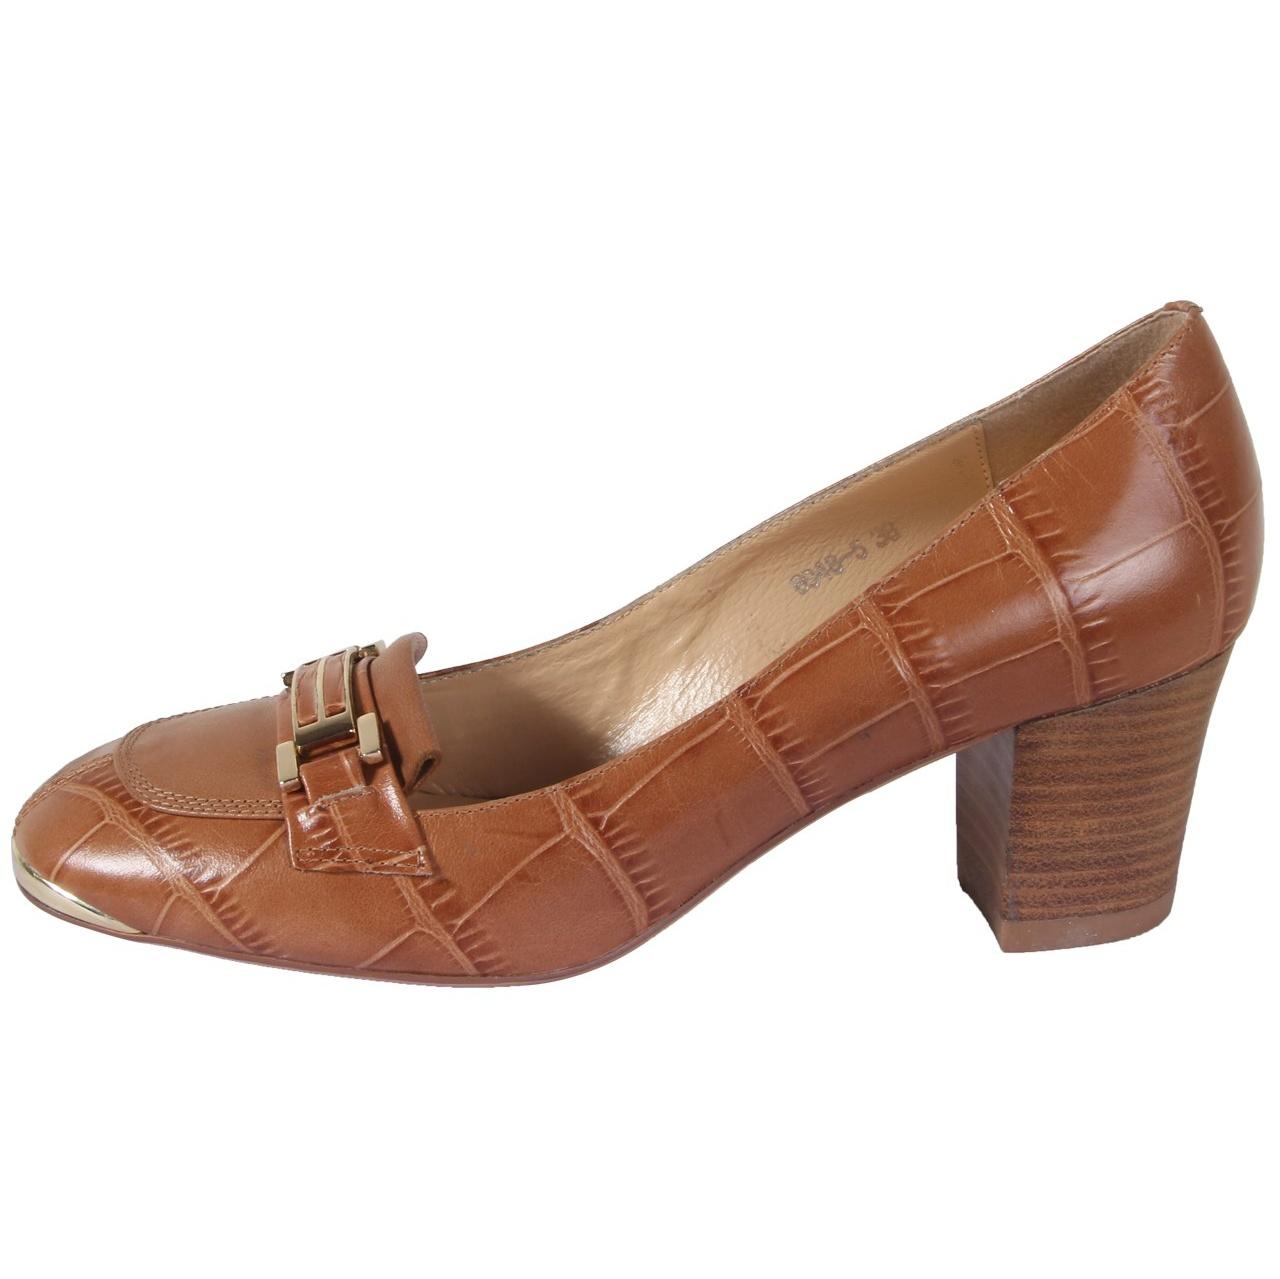 کفش چرم زنانه شهر چرم مدل 6-5-6948